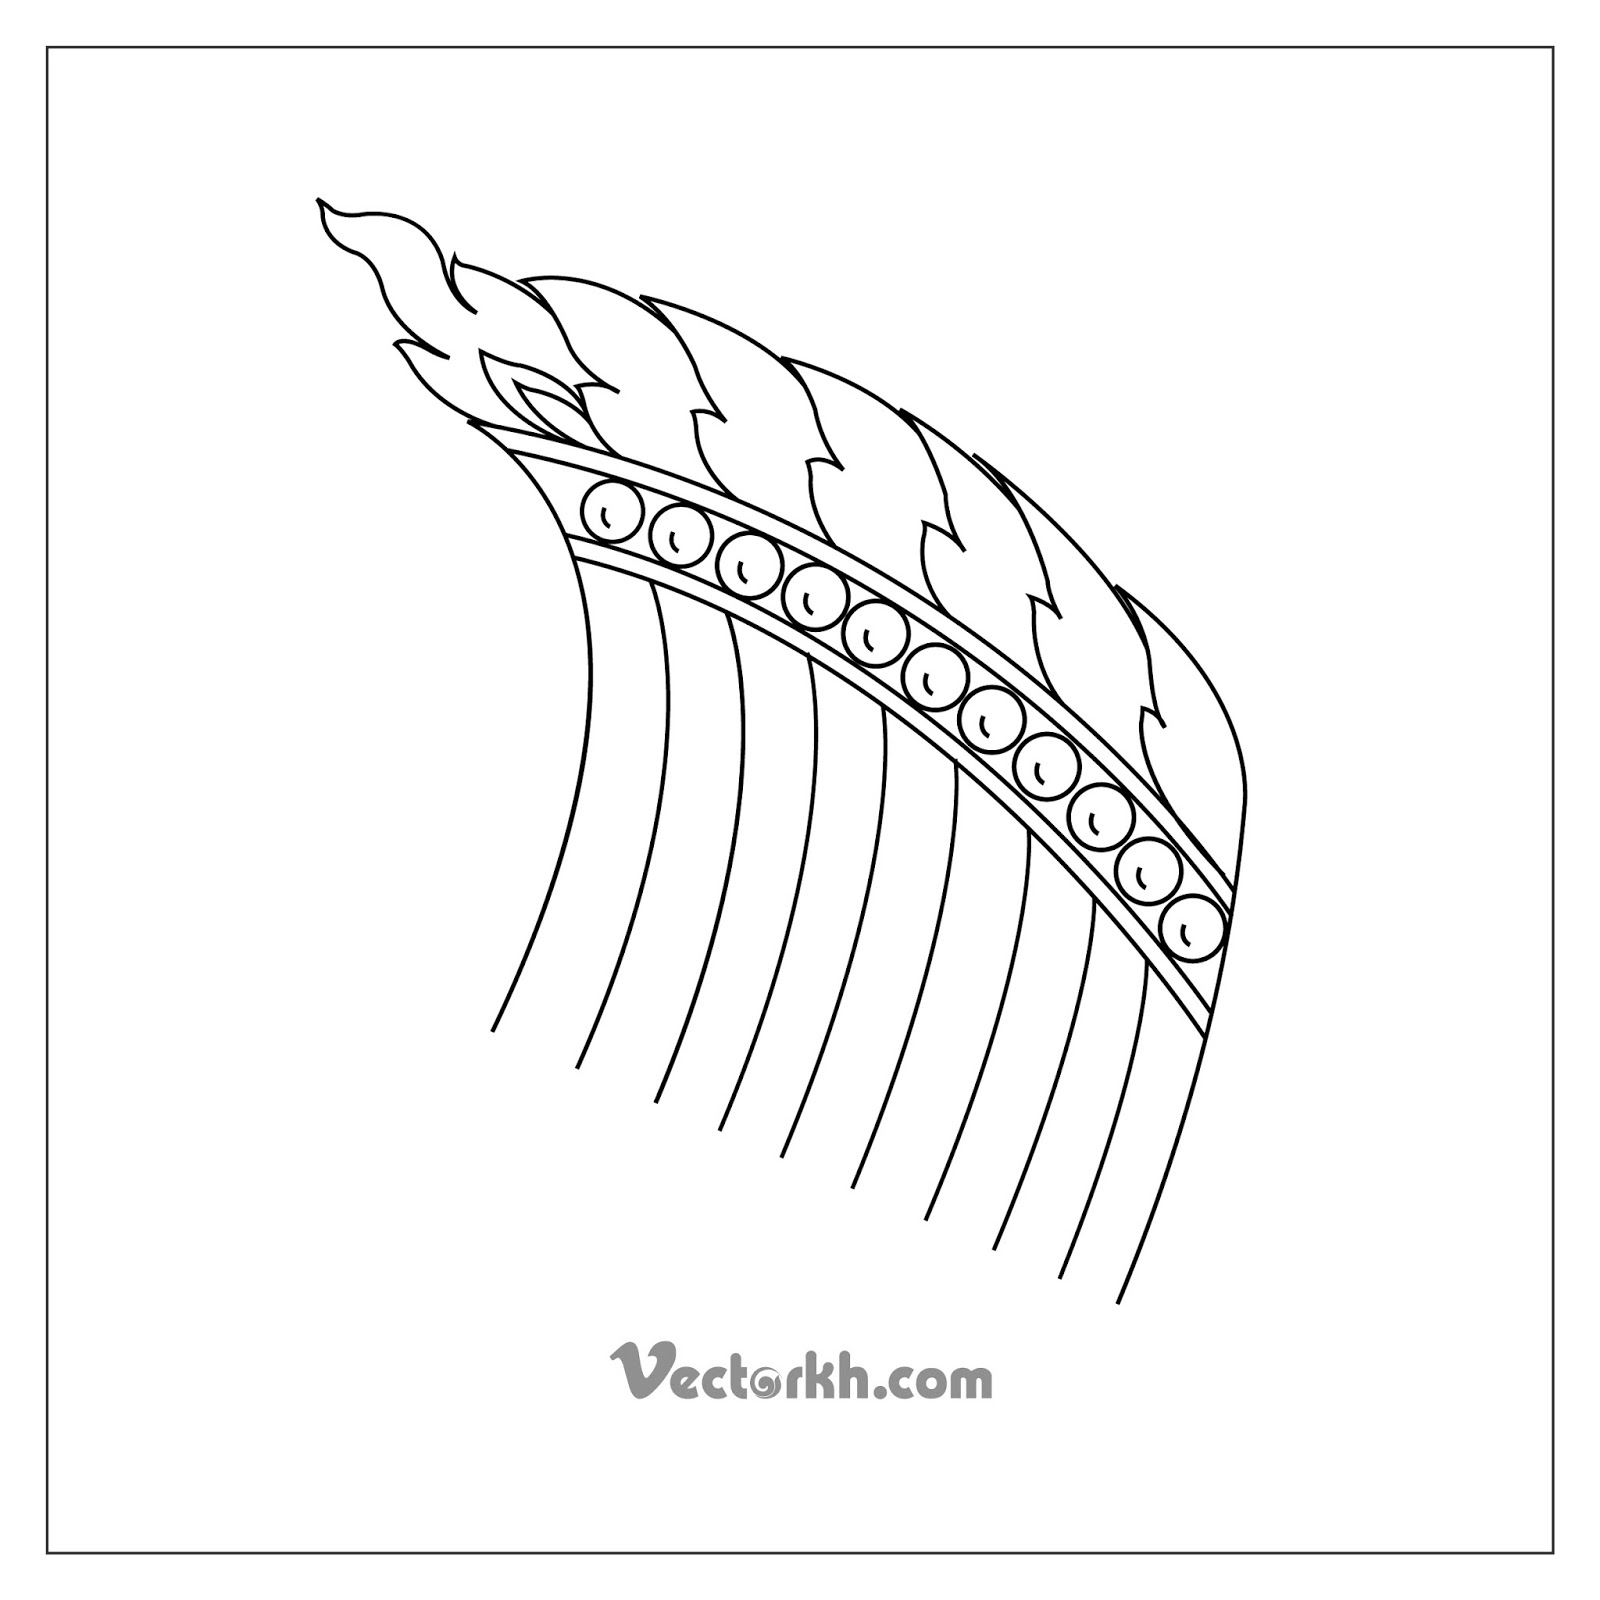 Kbach khmer khmer art free vector by vectorkh vectorkh vectorkh is the free graphic resources finder leader in the world vectors psd logo and icons click here in vector kbach khmer by vectorkh stopboris Choice Image